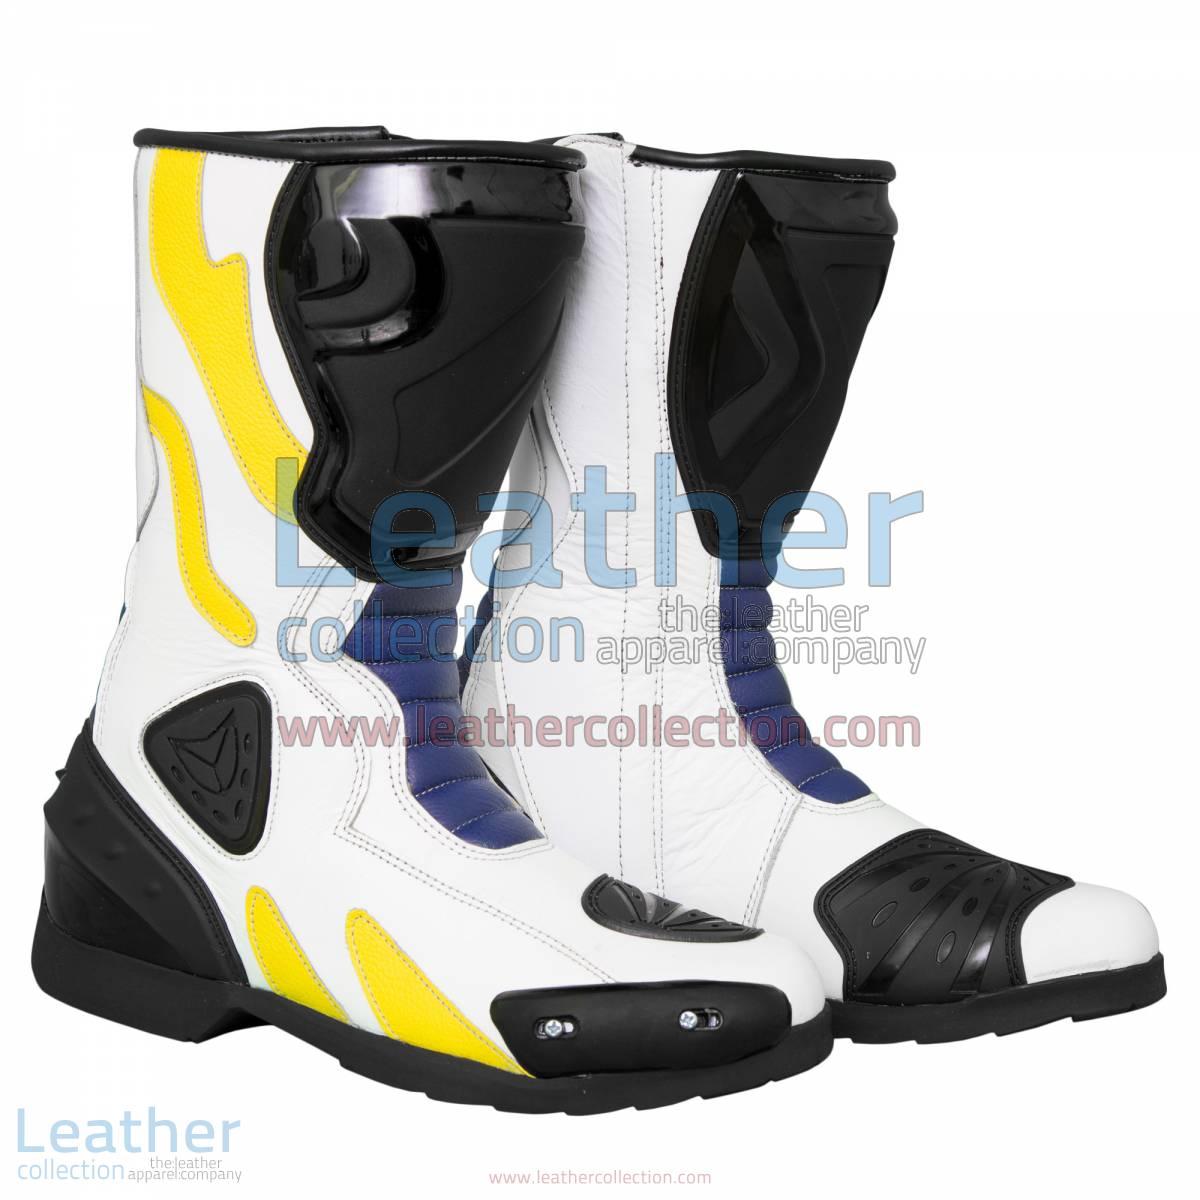 Chris Vermeulen Rizla Suzuki Race Boots